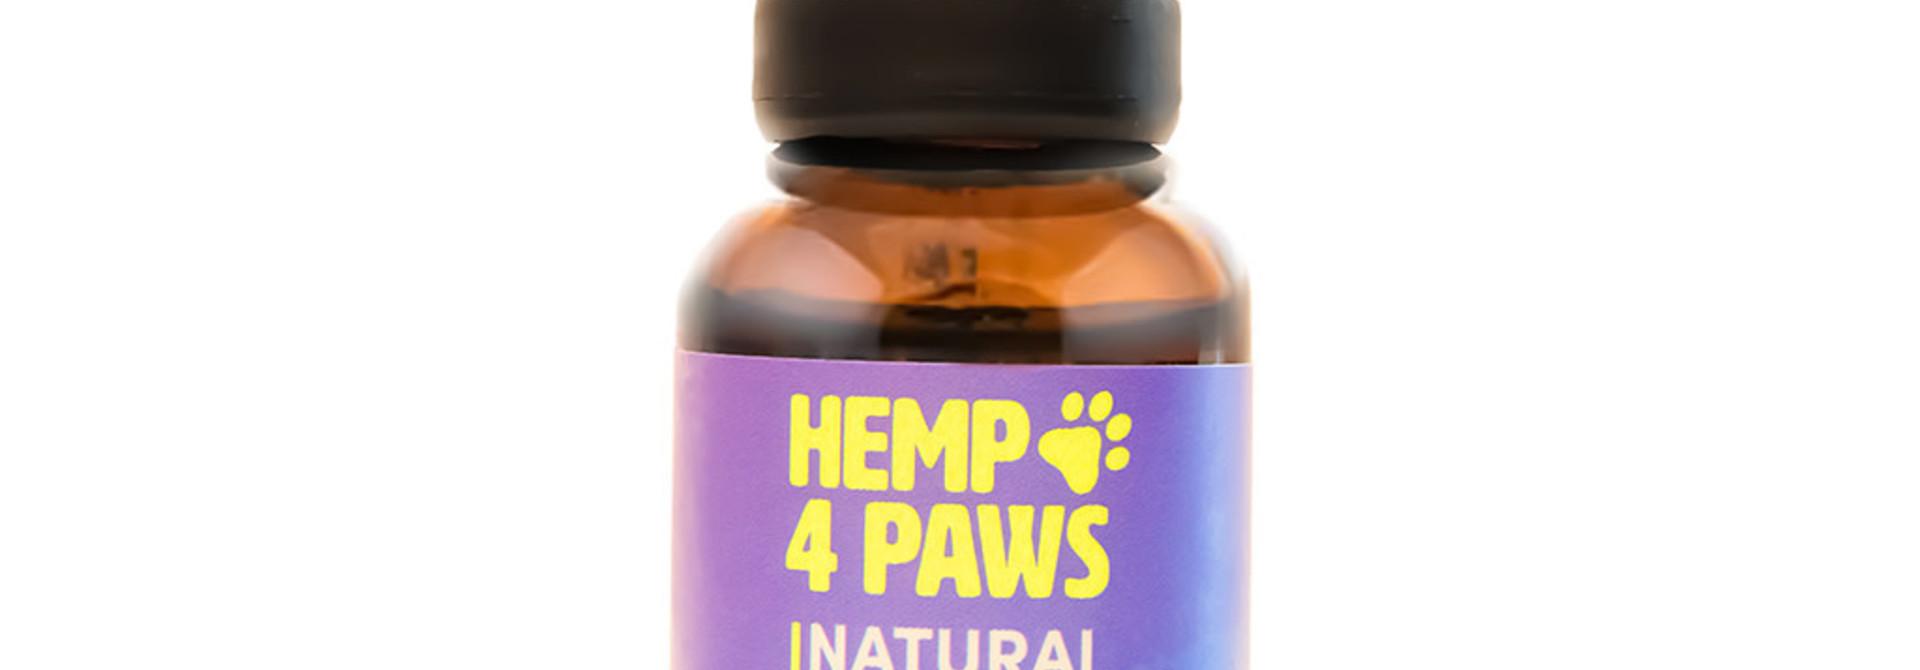 Hemp 4 Paws - Medium Breed 300mg-30ml